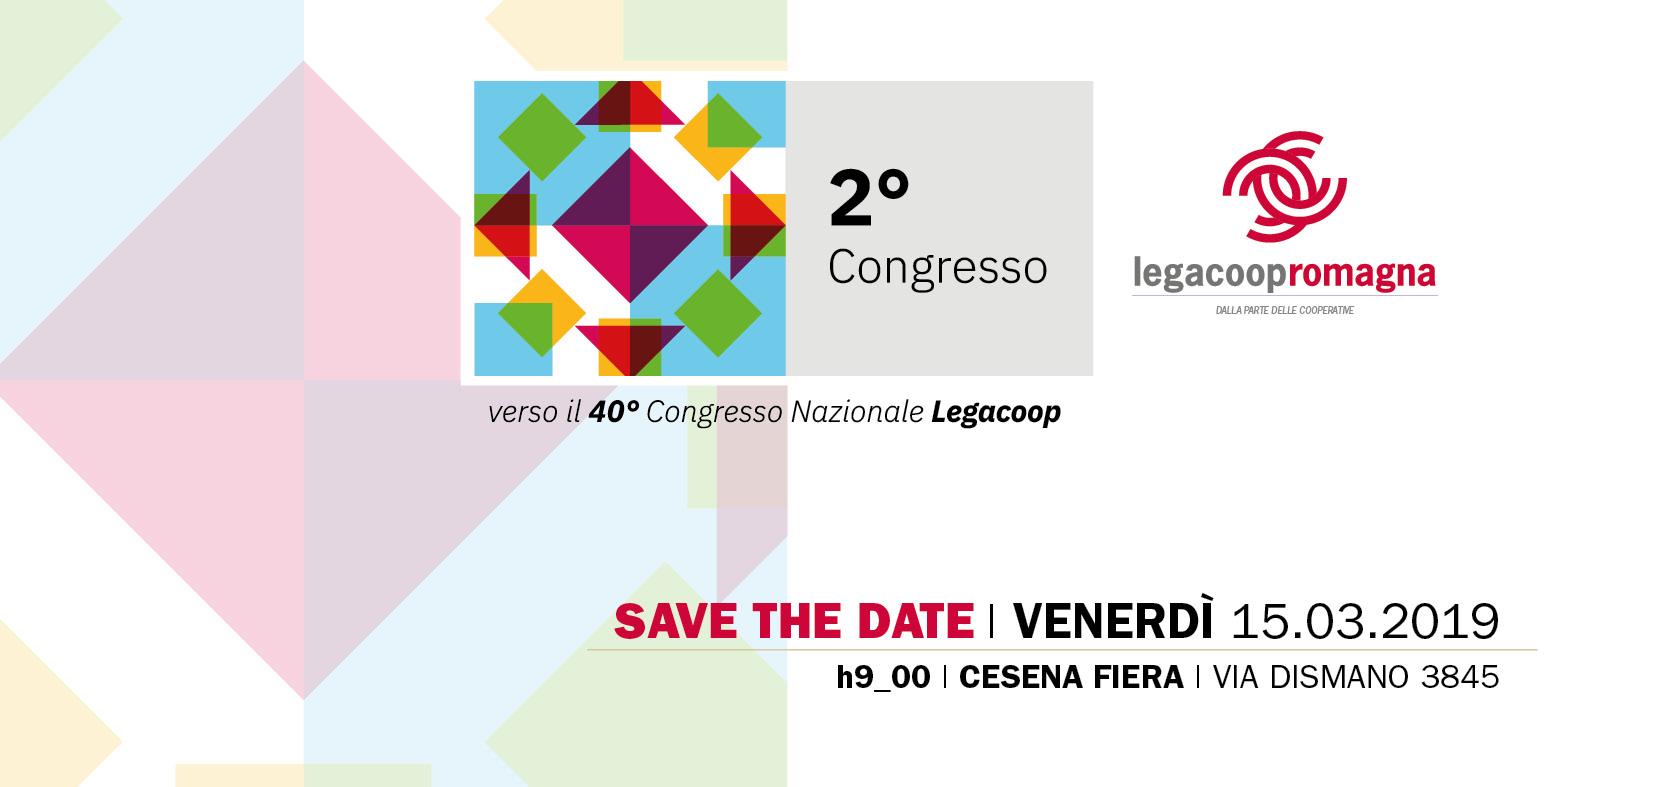 Congresso Legacoop Romagna il 15/3 a Cesena